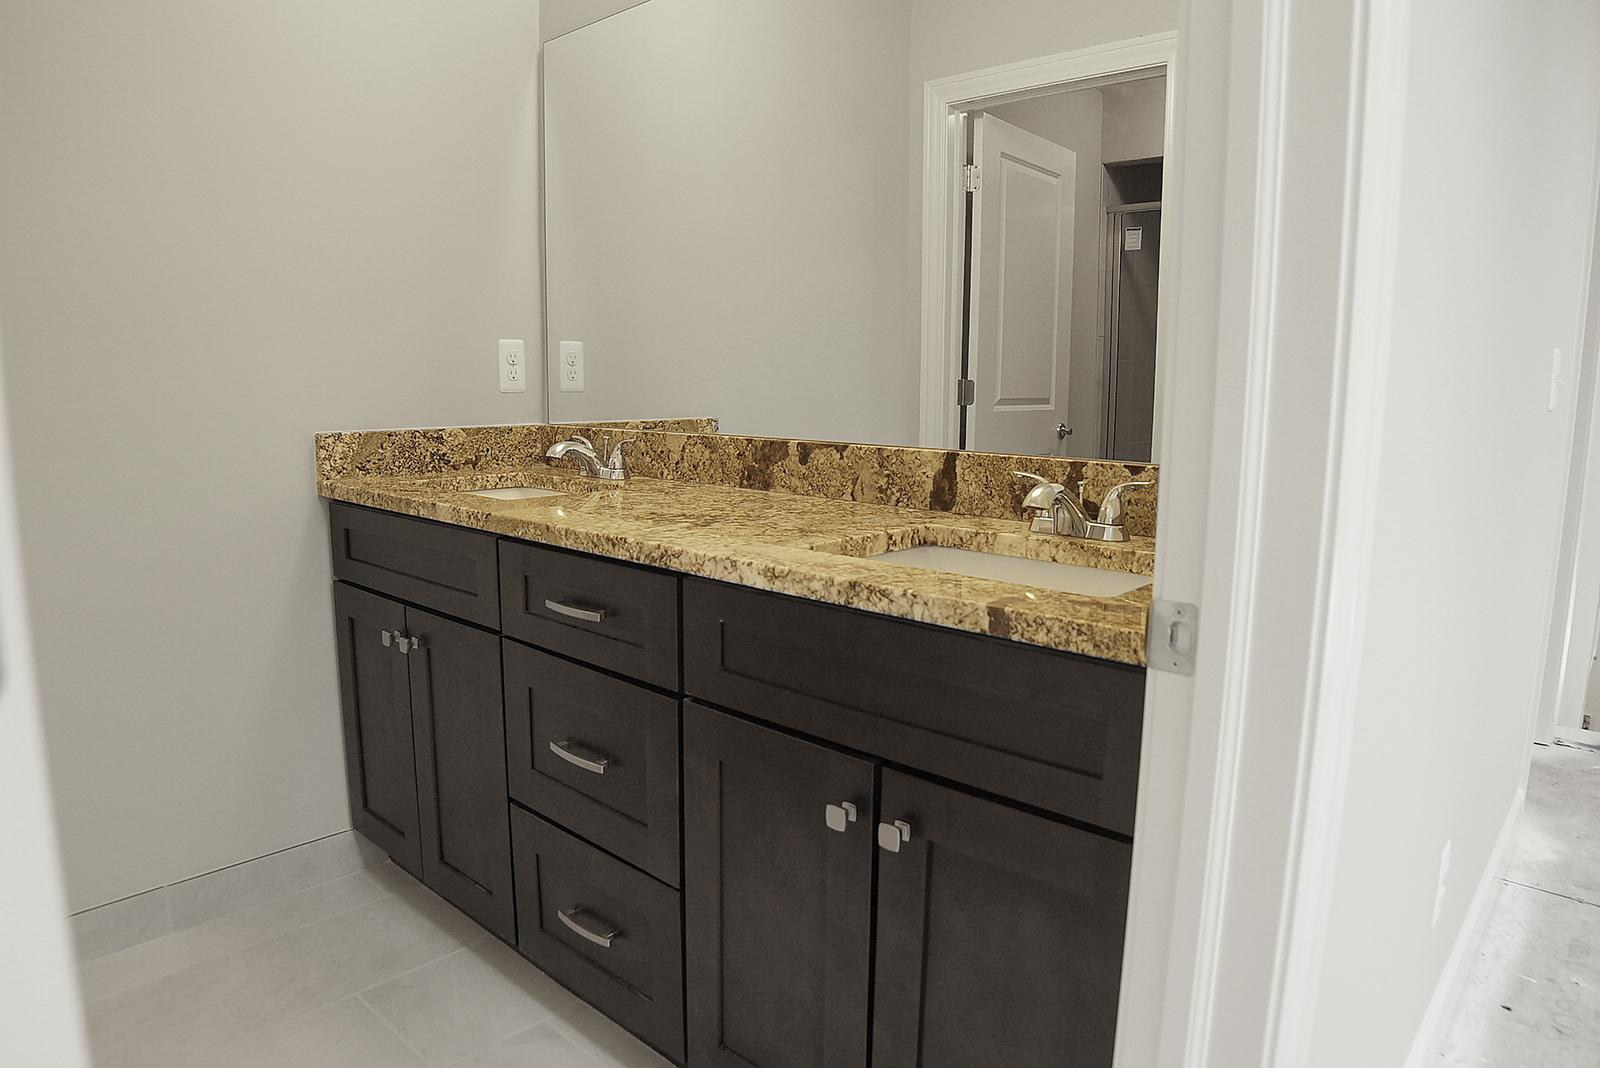 Bathroom_counter_DSC06034.jpg